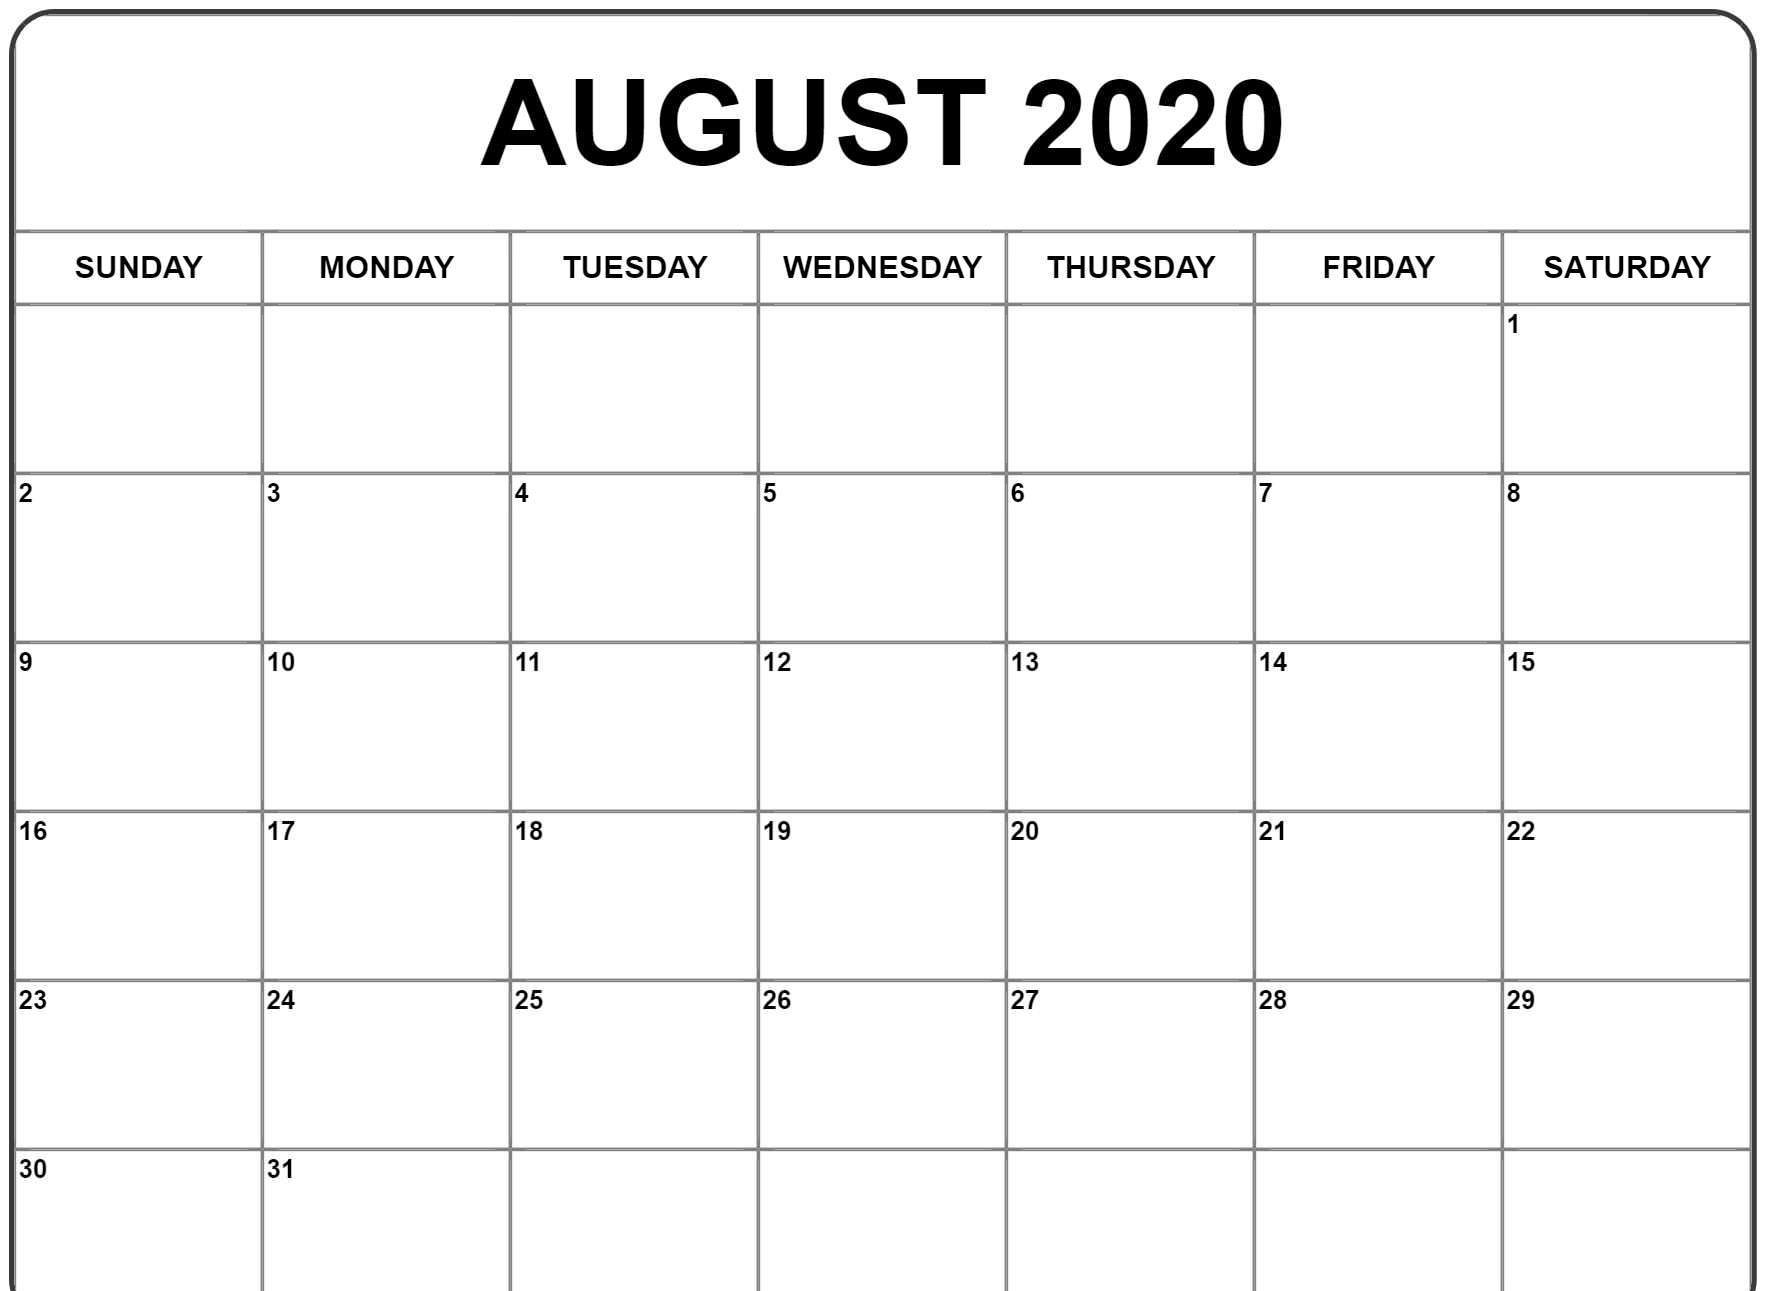 August 2020 Calendar Pdf, Word, Excel Printable Template